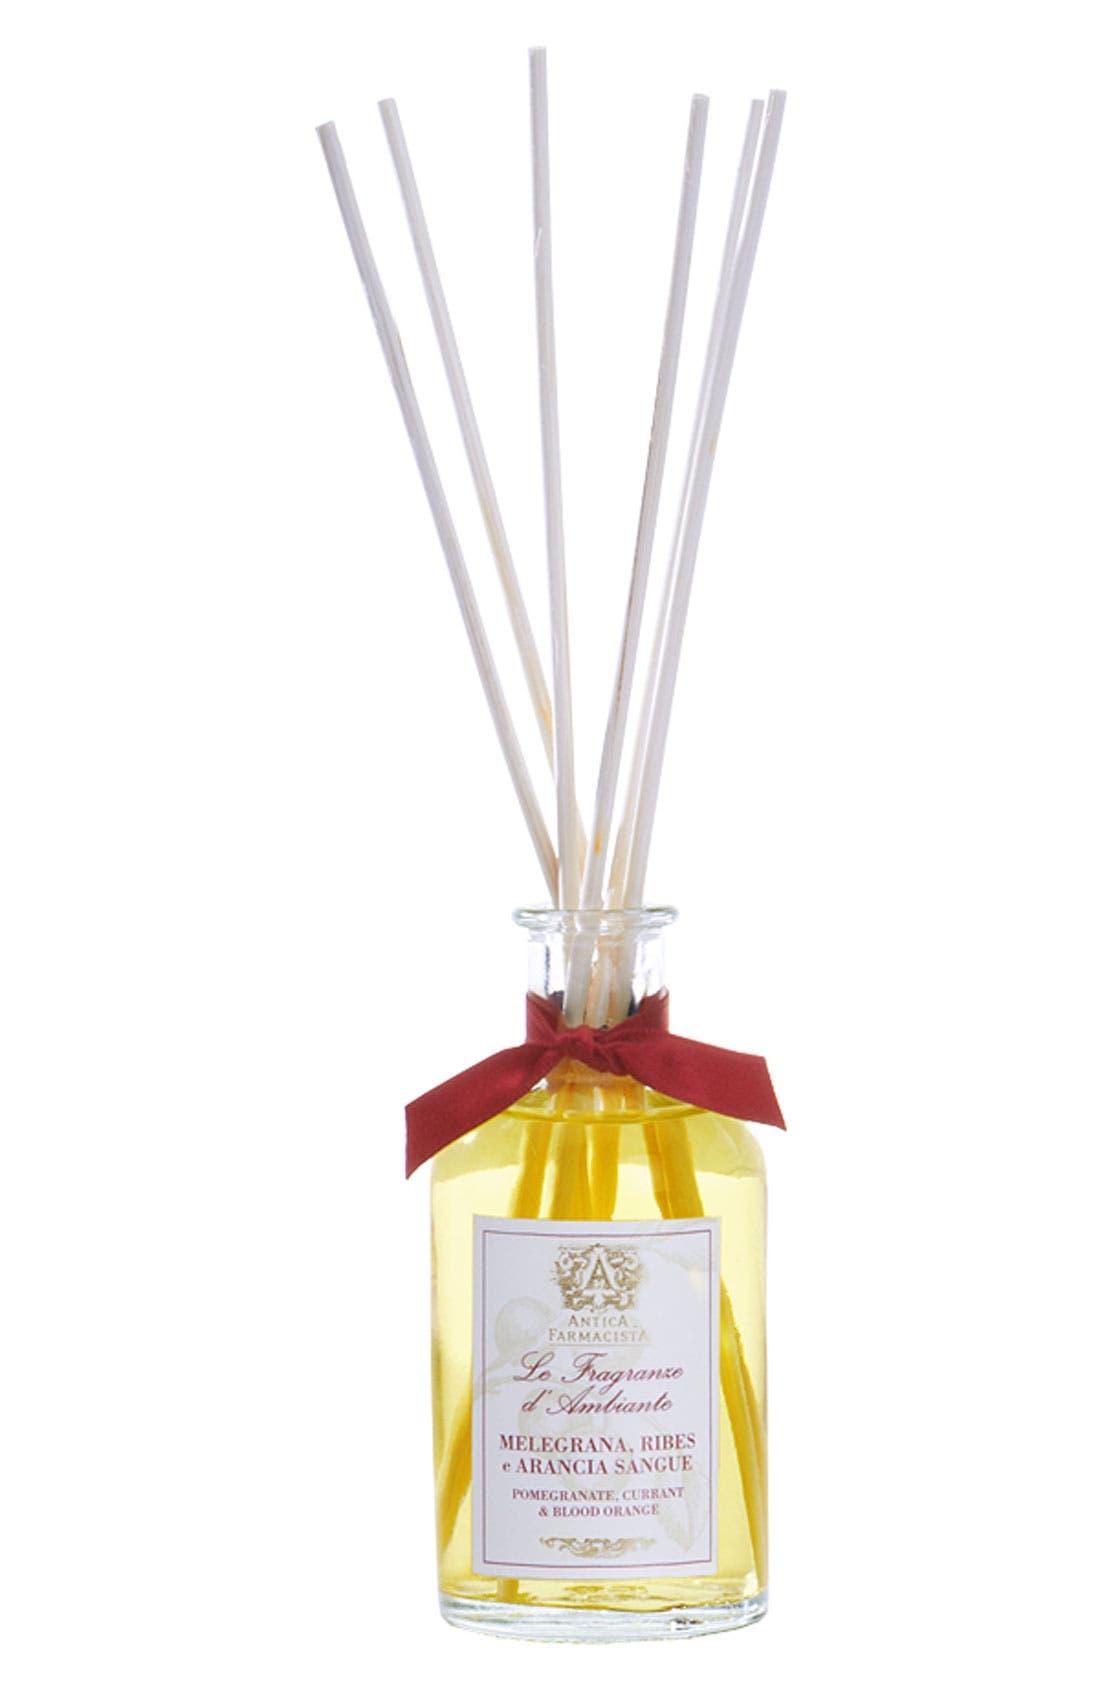 Antica Farmacista 'Pomegranate, Currant & Blood Orange' Home Ambiance Perfume (3.3 oz.)